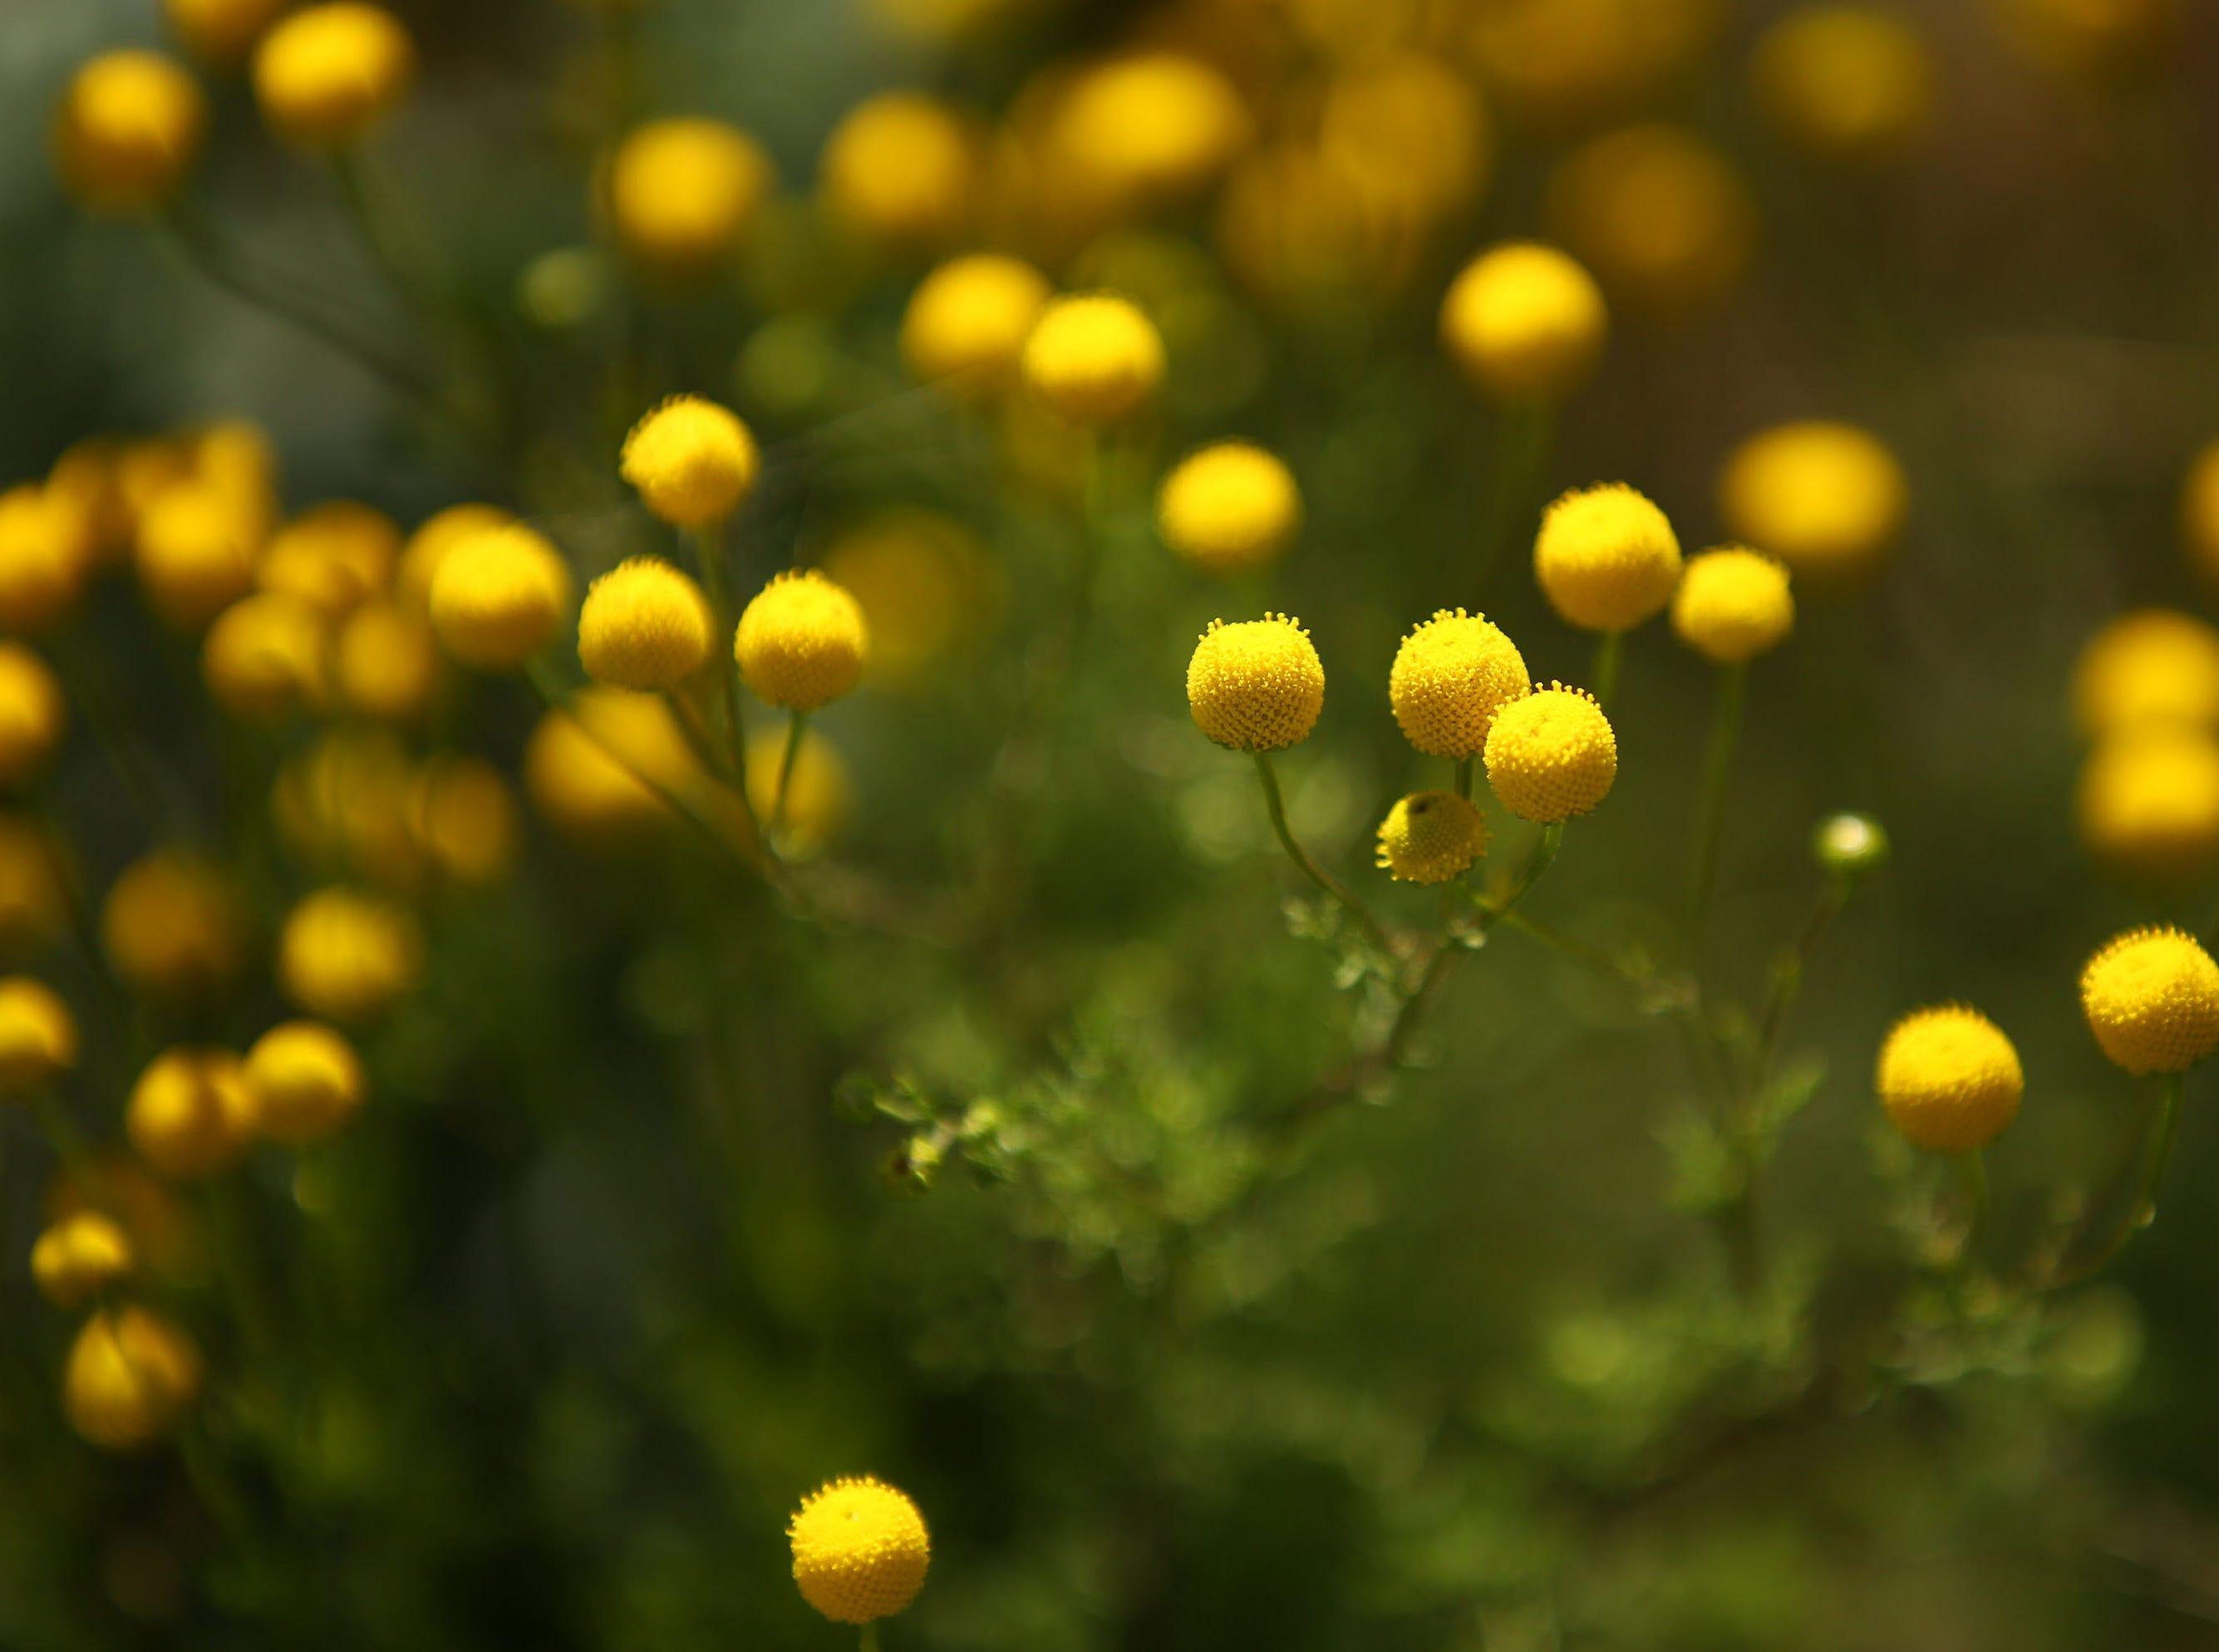 Desert wildflowers bloom in South Mountain Park on March 6, 2019, in Phoenix.